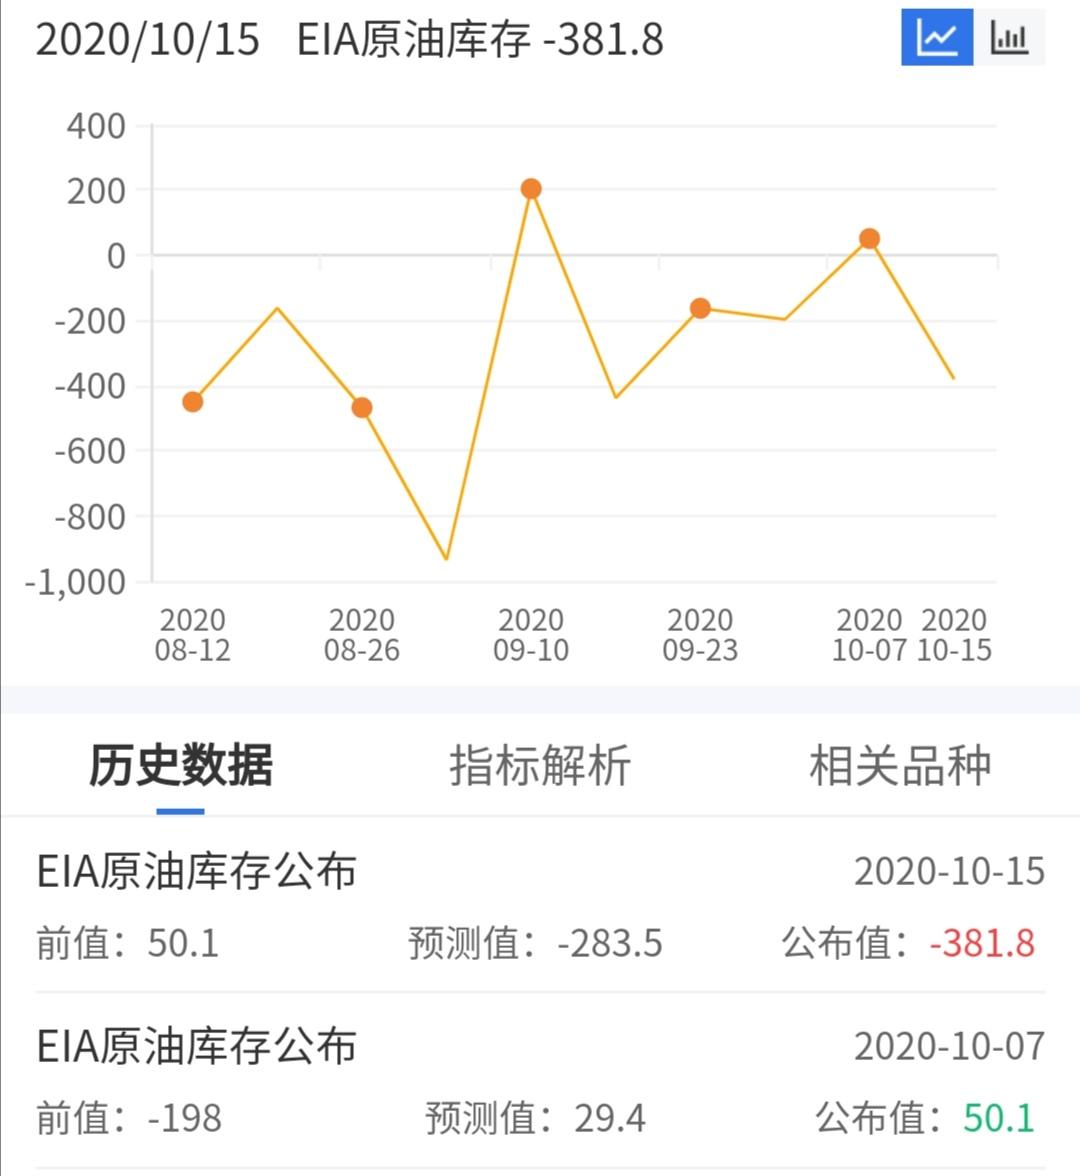 EIA数据利好OPEC+难再增产明年油市或反弹